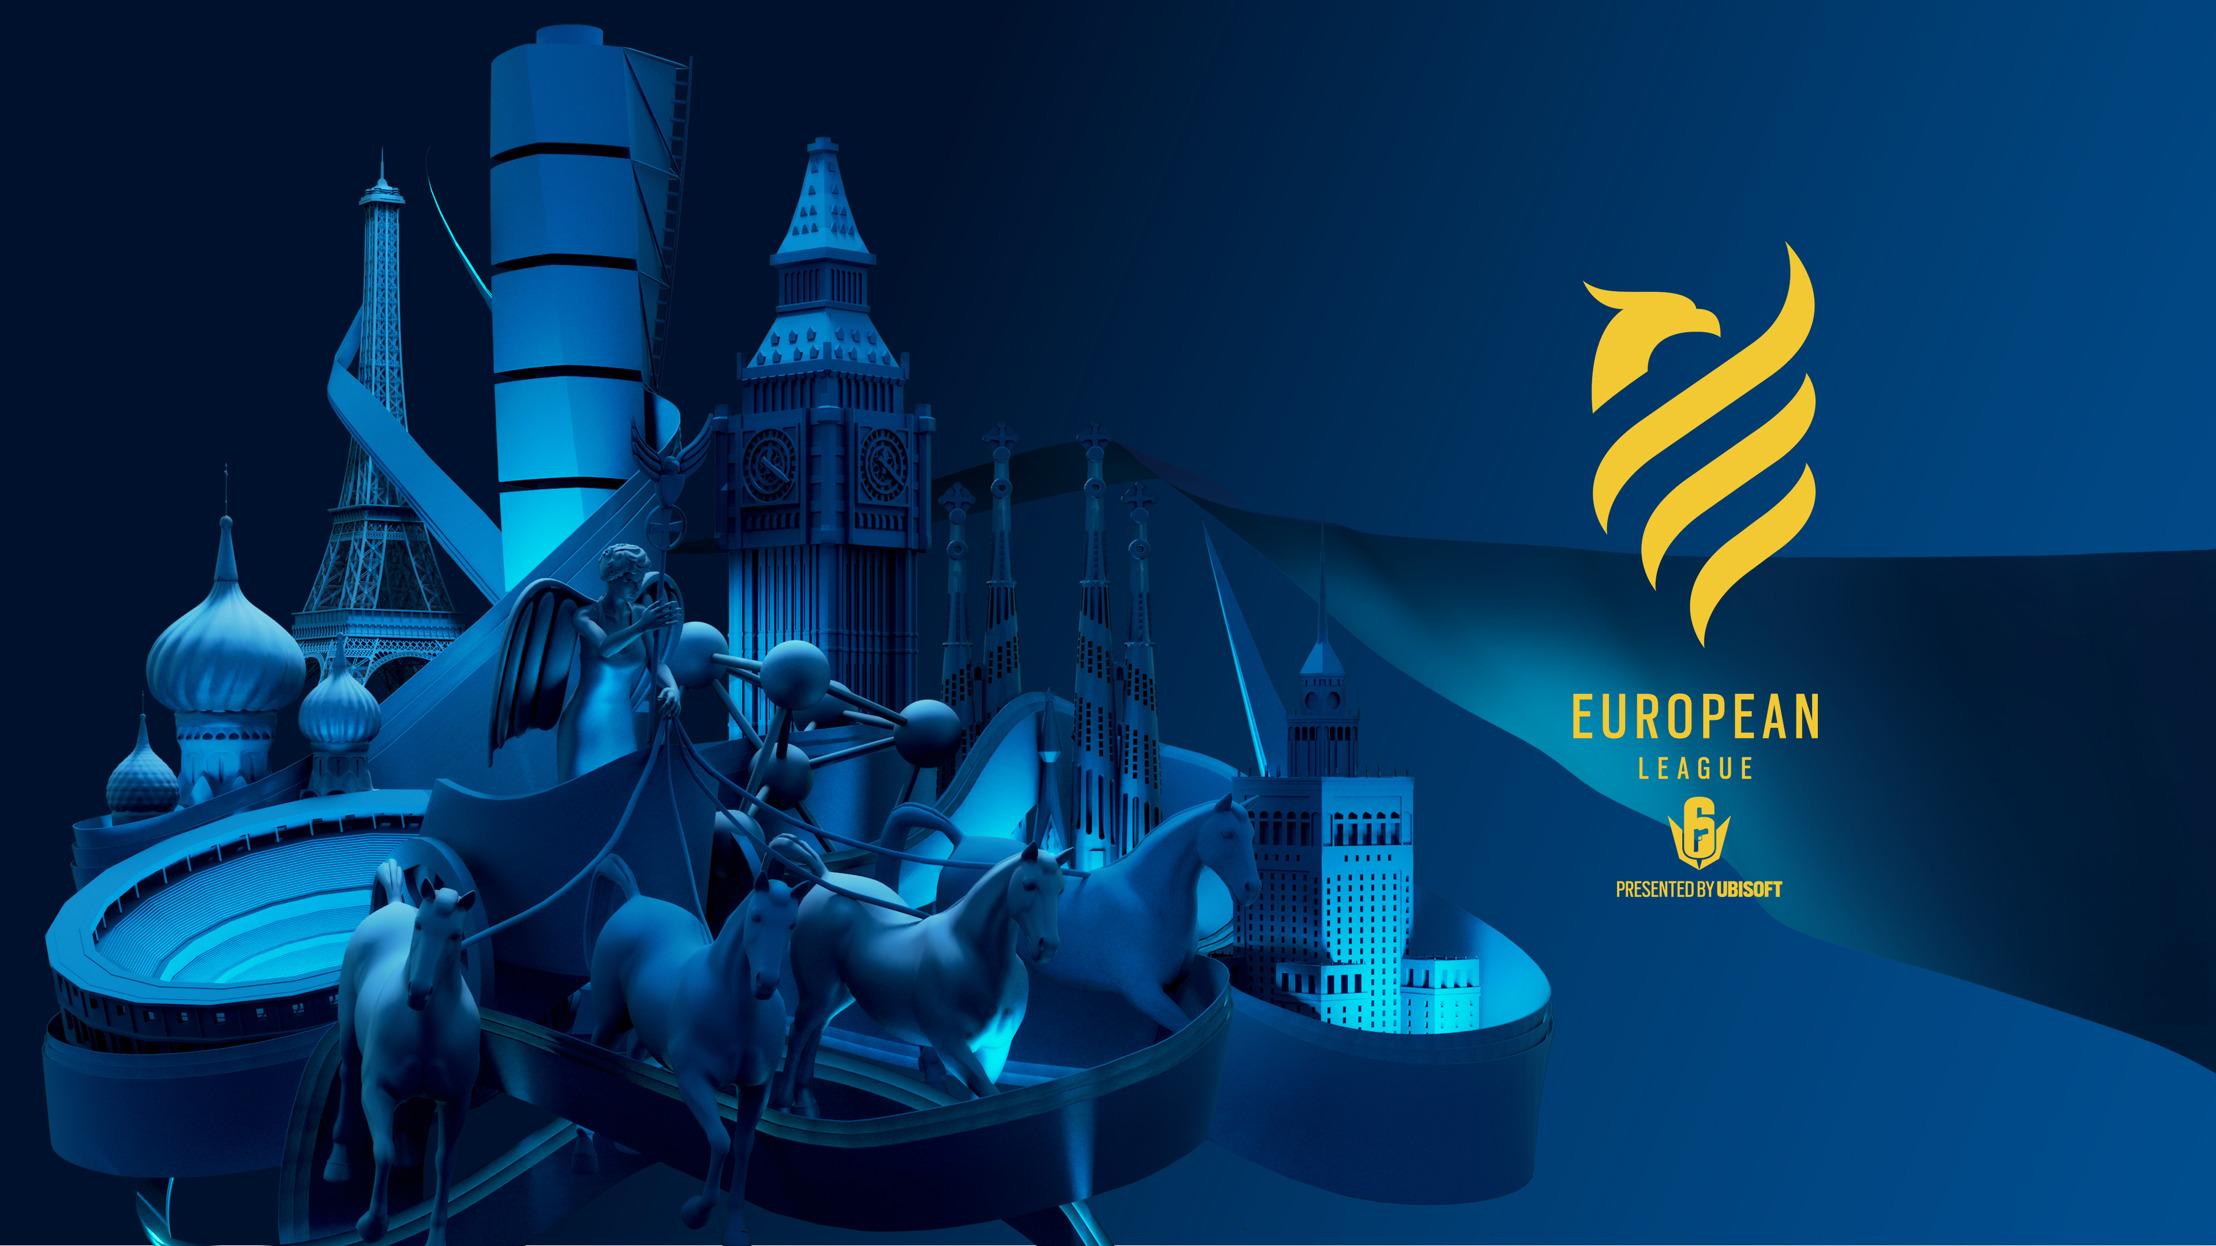 Preview: RAINBOW SIX SIEGE: EUROPEAN LEAGUE STAGE 3 BEGINNT AM 9. SEPTEMBER